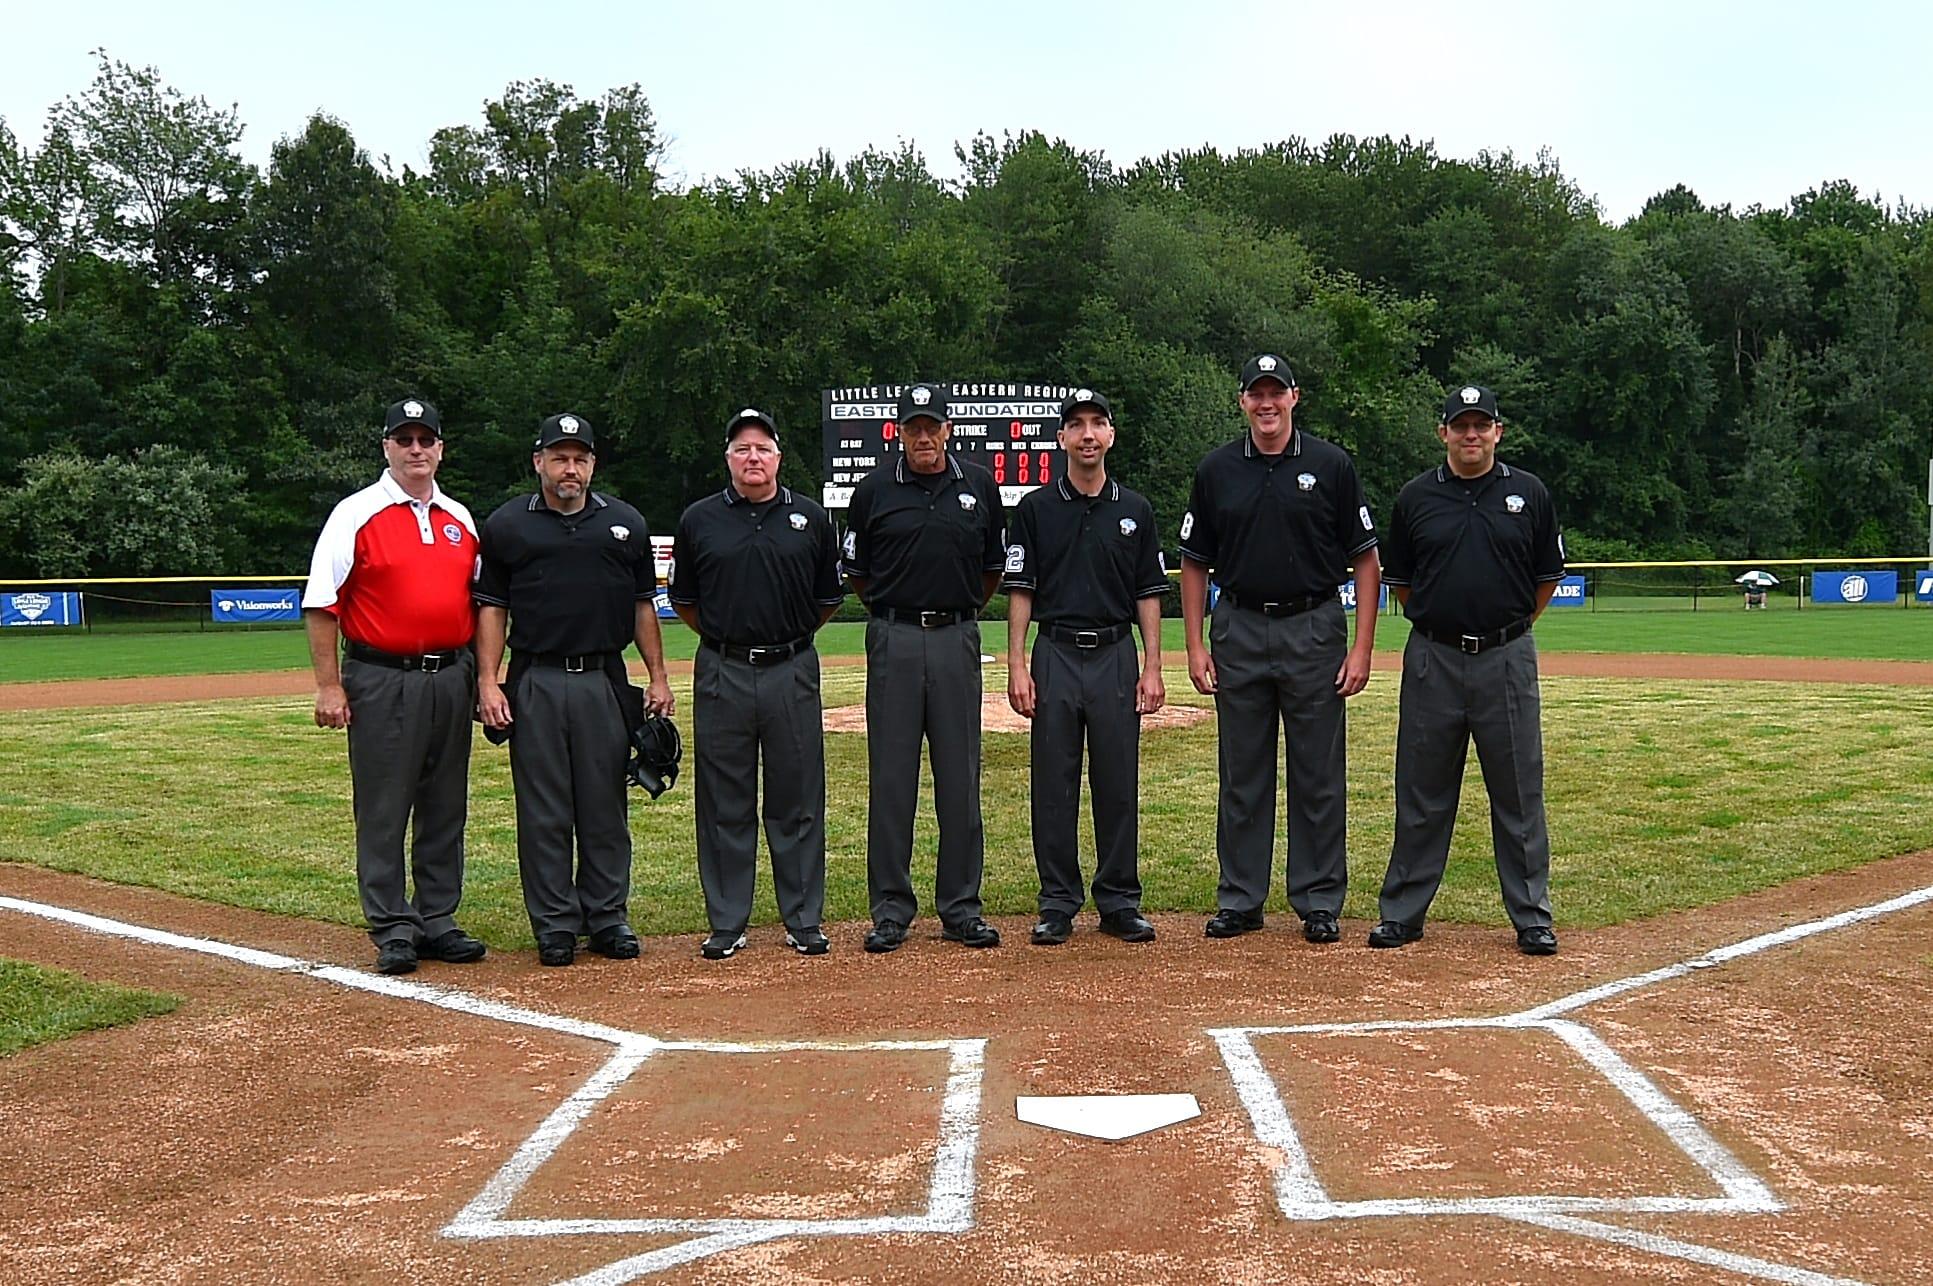 east regional umpires